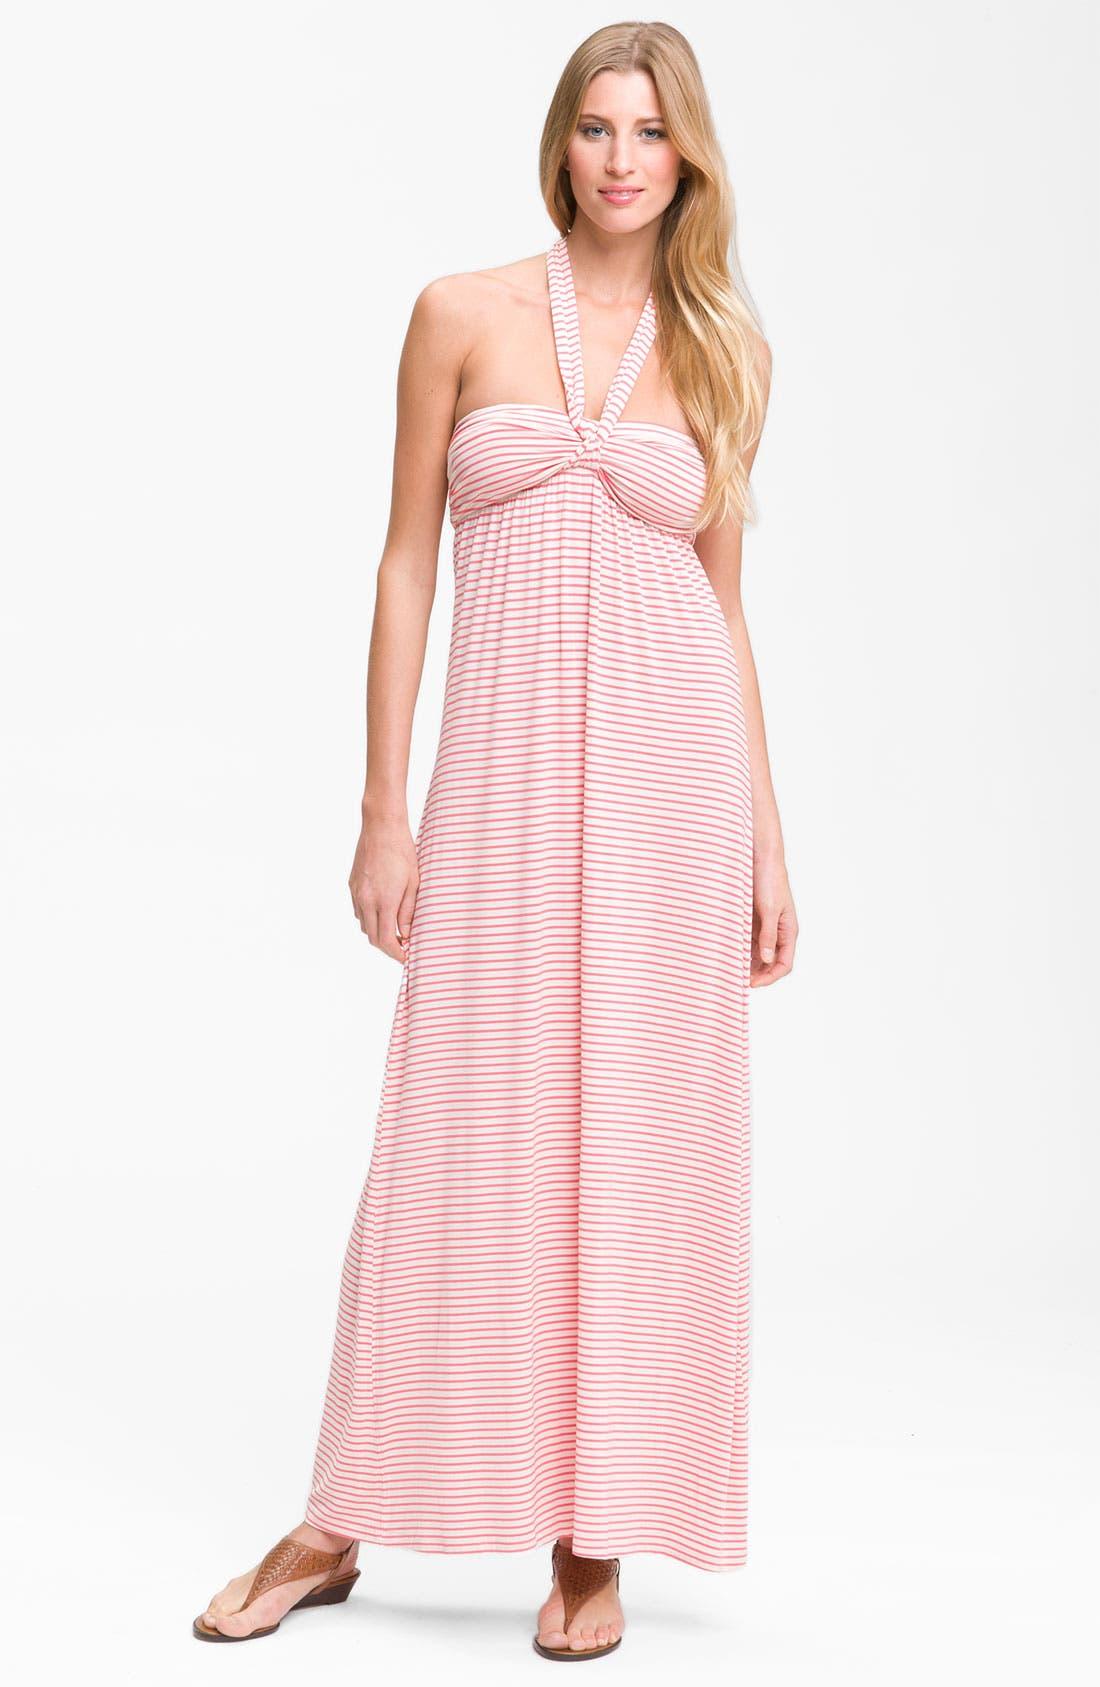 Alternate Image 1 Selected - Felicity & Coco Stripe Halter Maxi Dress (Nordstrom Exclusive)